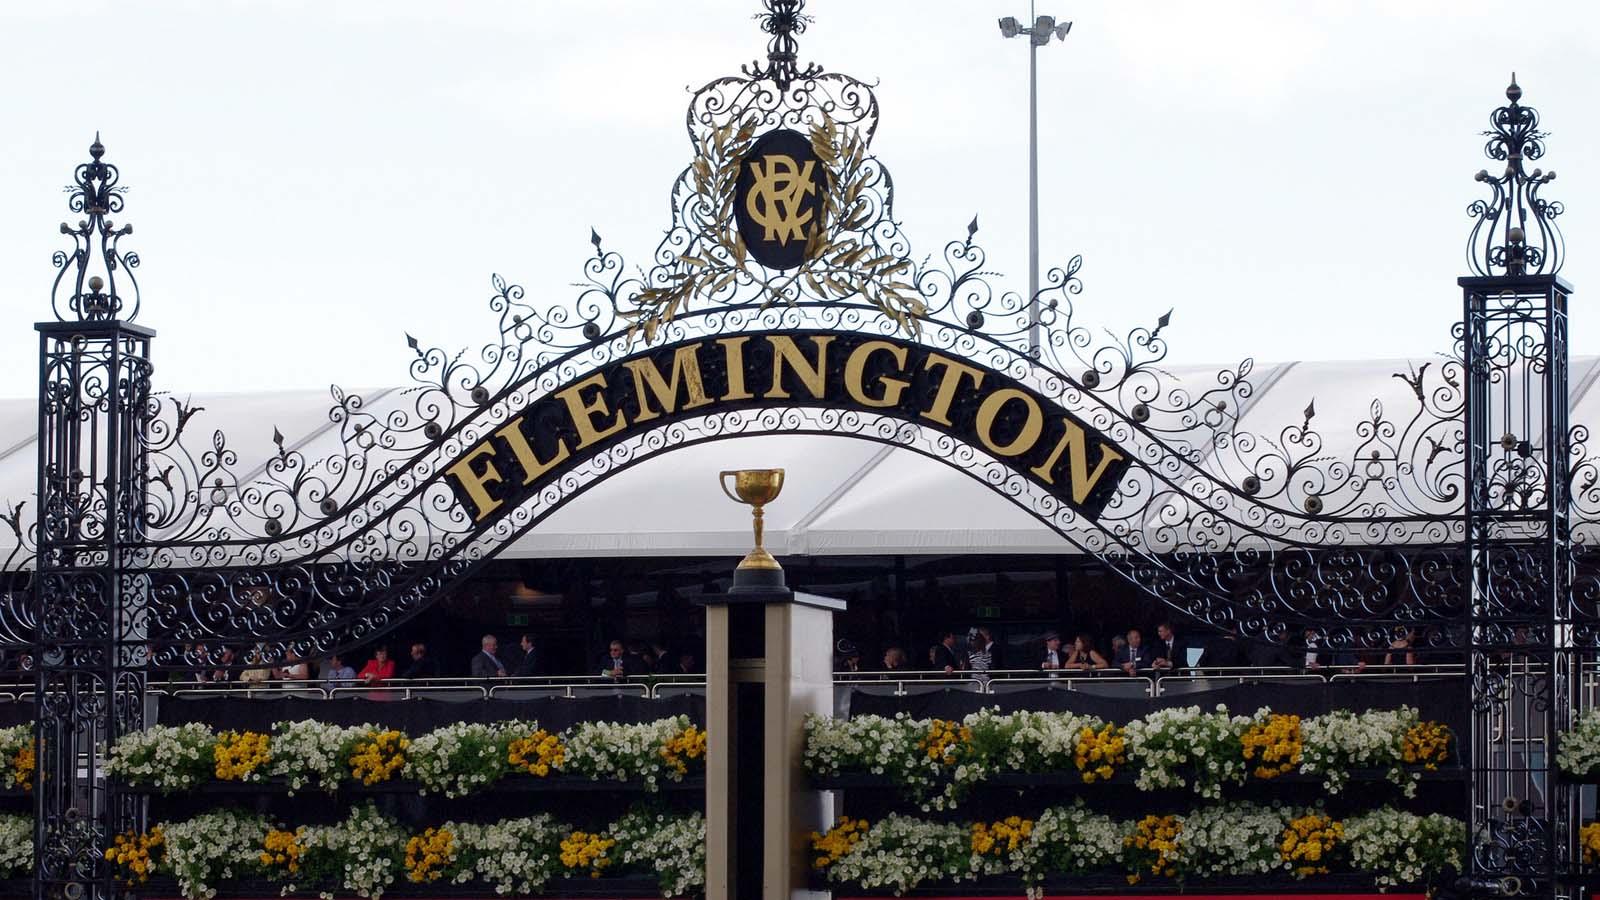 Flemington Racecourse, Flemington, Melbourne, Victoria, Australia